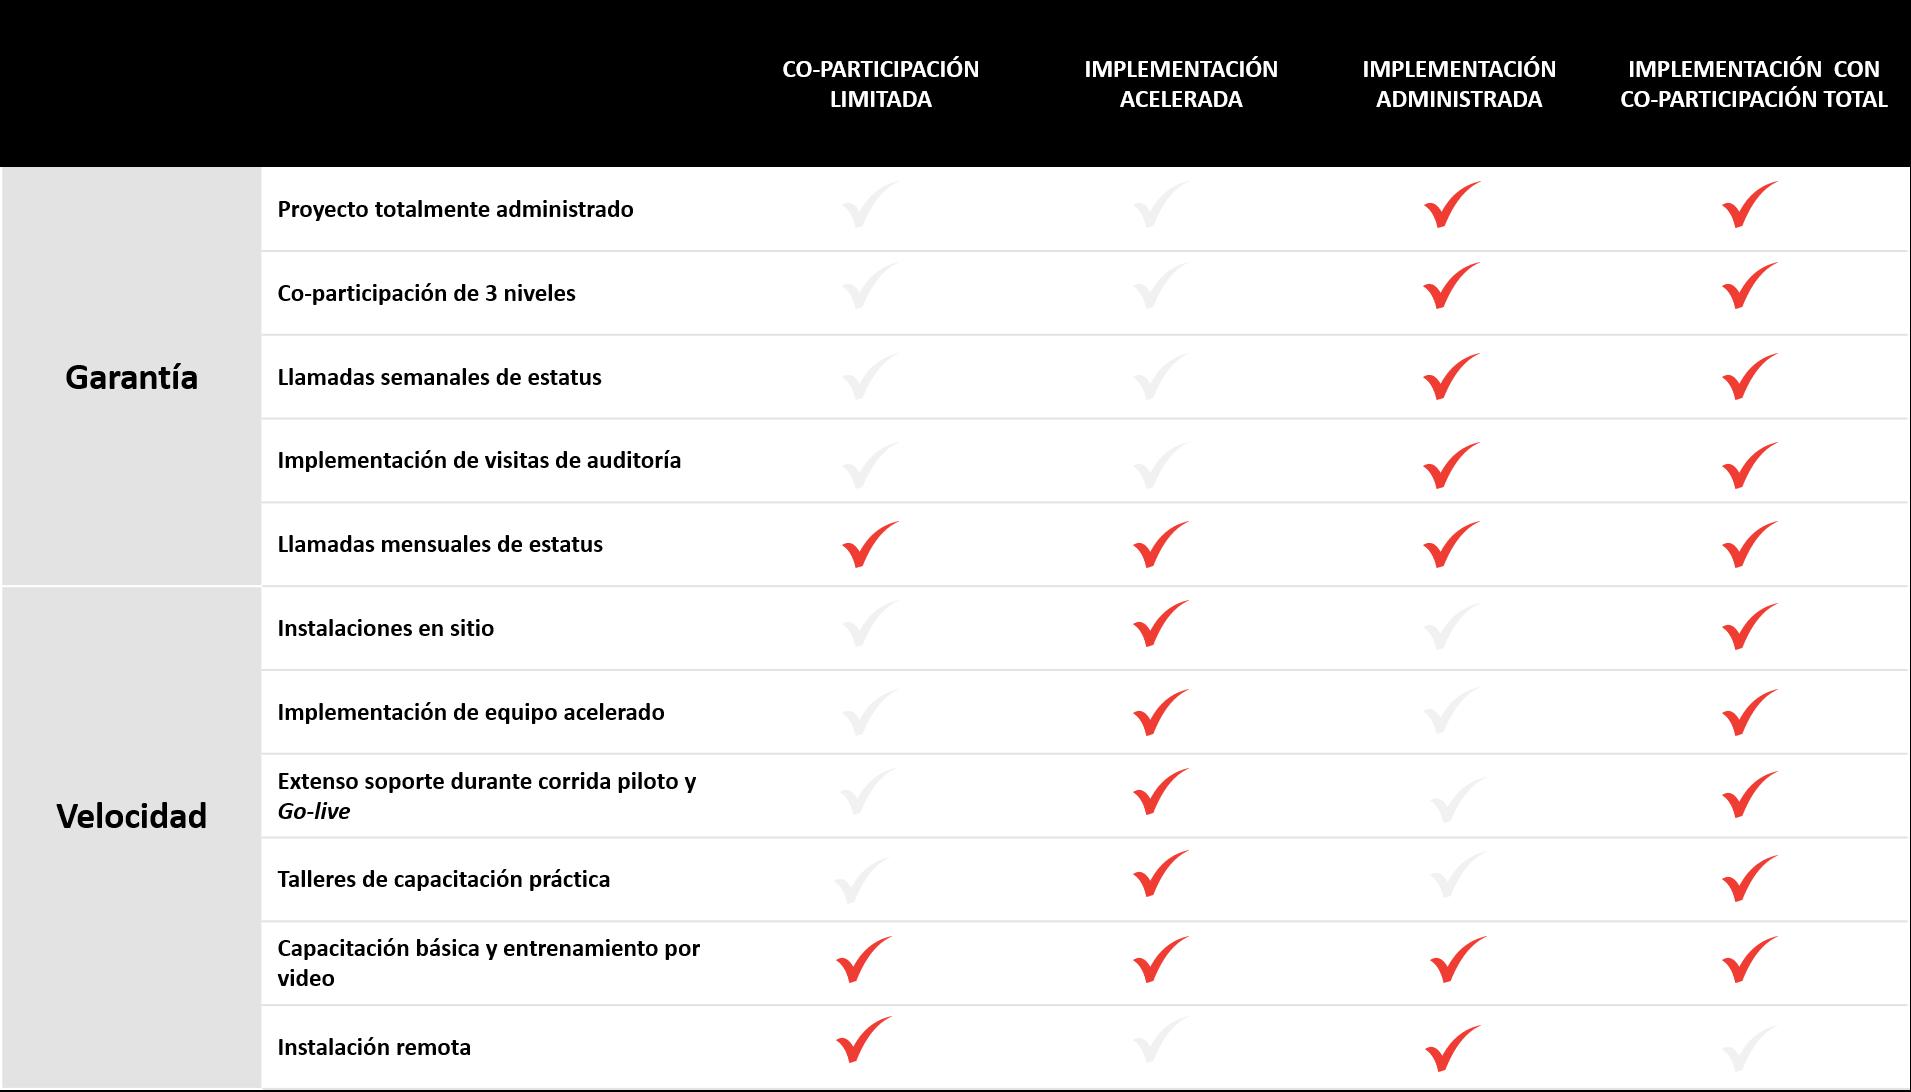 Paquetes de implementación